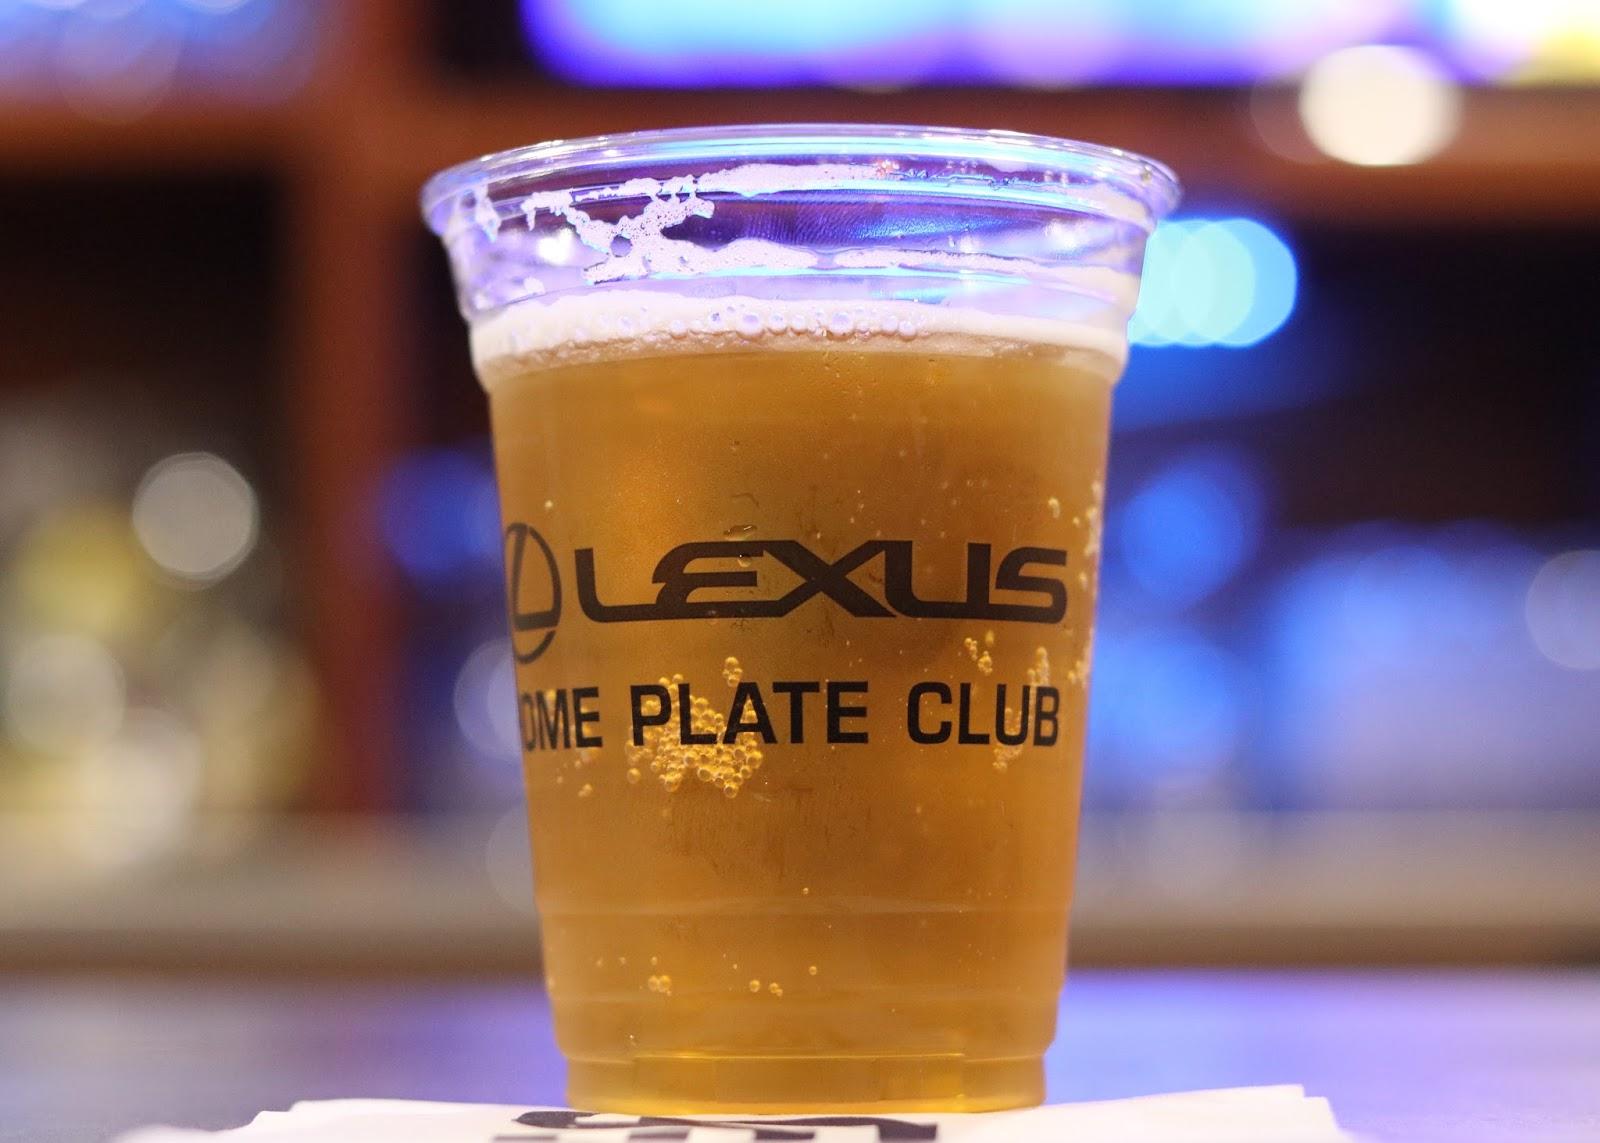 lexus home plate club, blogger in san diego, san diego lifestyle blogger